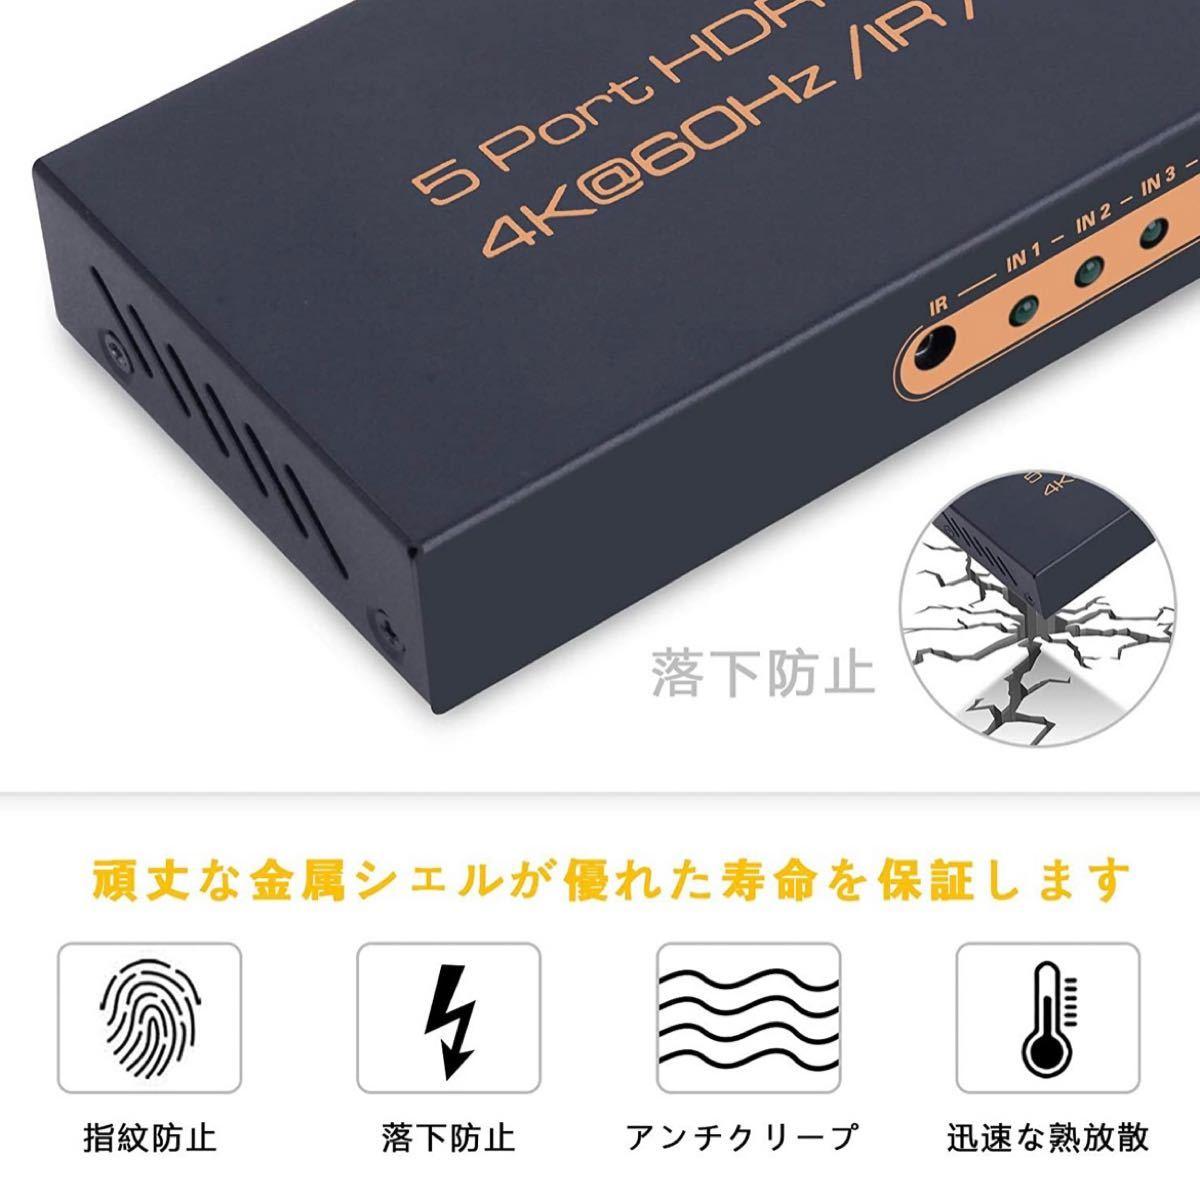 HDMI 切替器 5入力1出力 HDMI2.0 HDCP2.2対応 4K+3D